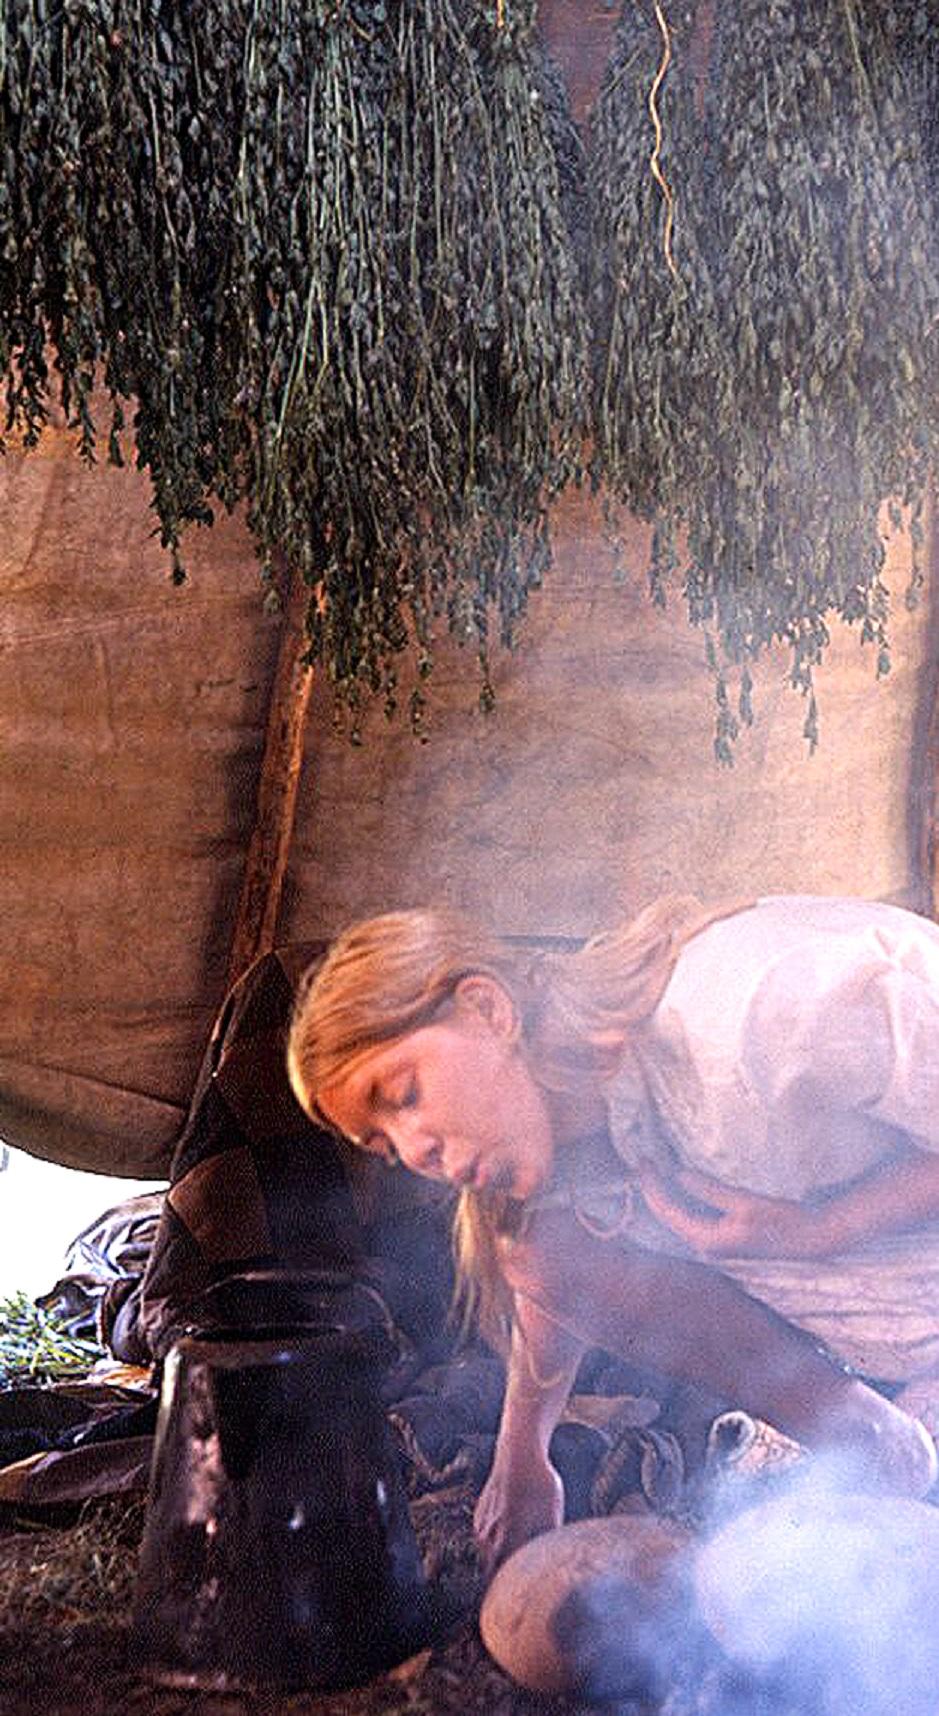 Smoking - Vortex 1 - 1970 - McIver State Park